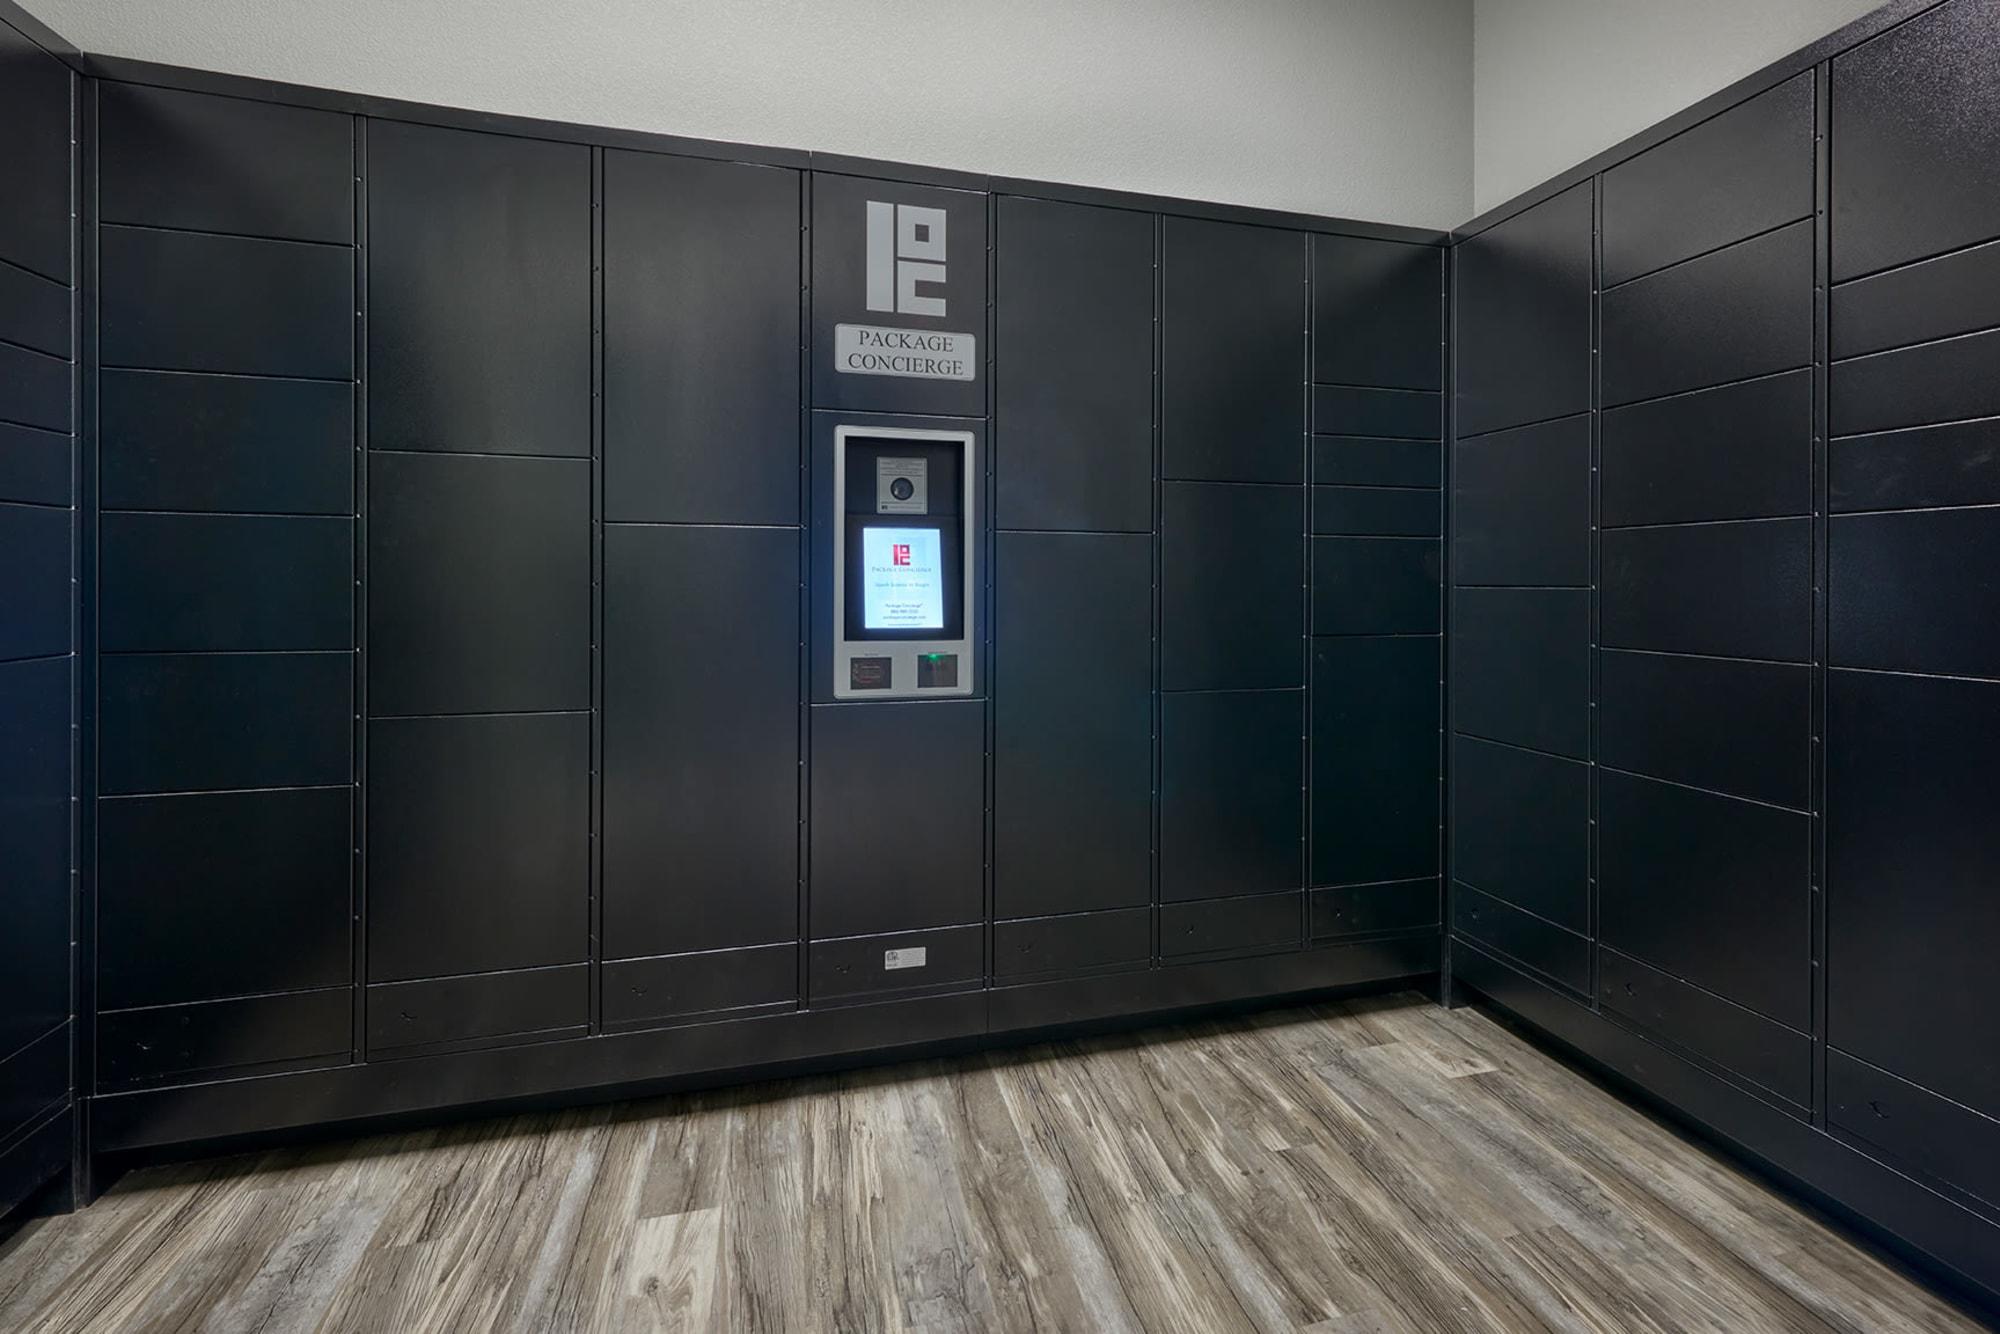 Package Locker System at Crestone Apartments in Aurora, Colorado